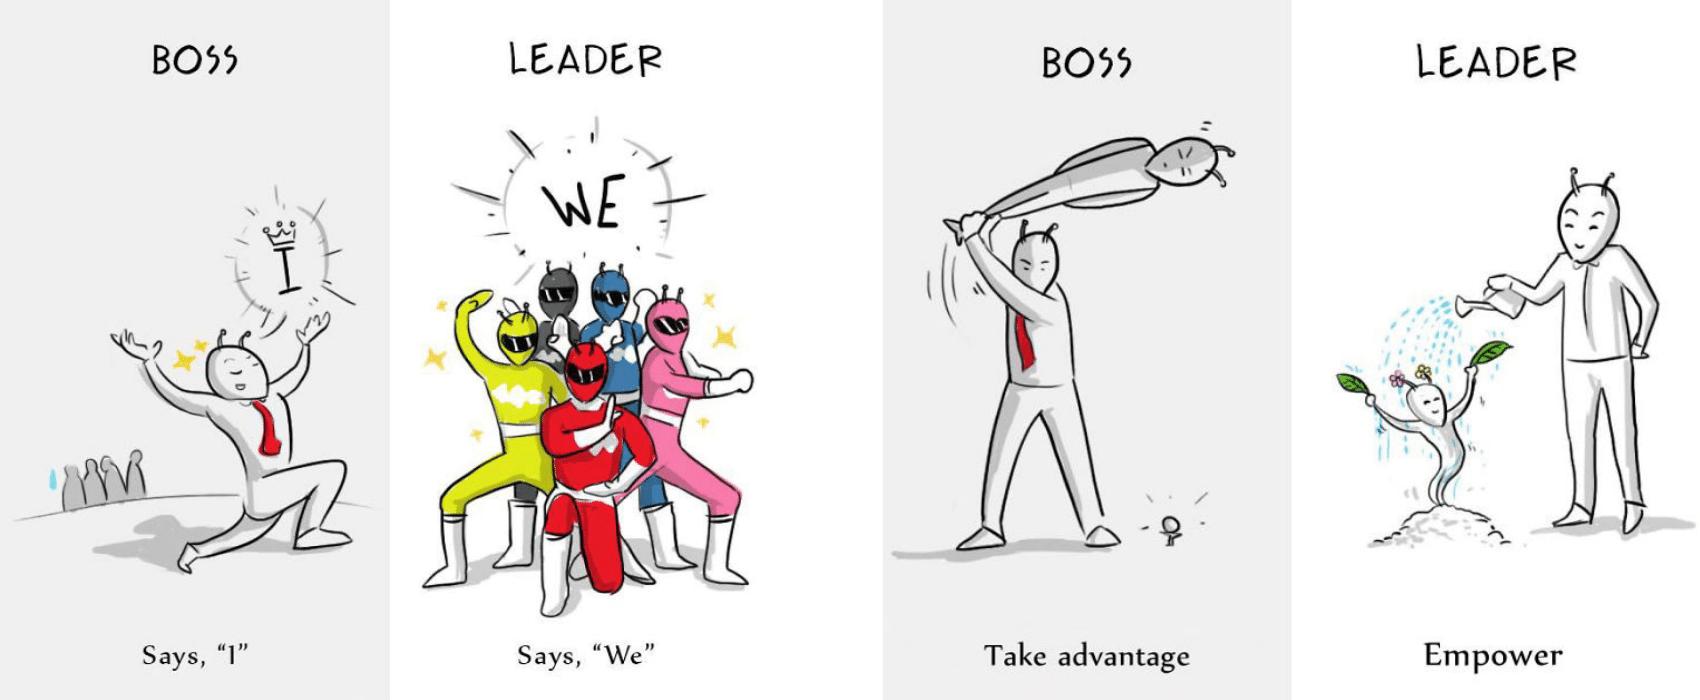 Boss vs Leader Comics from Yukbisnis